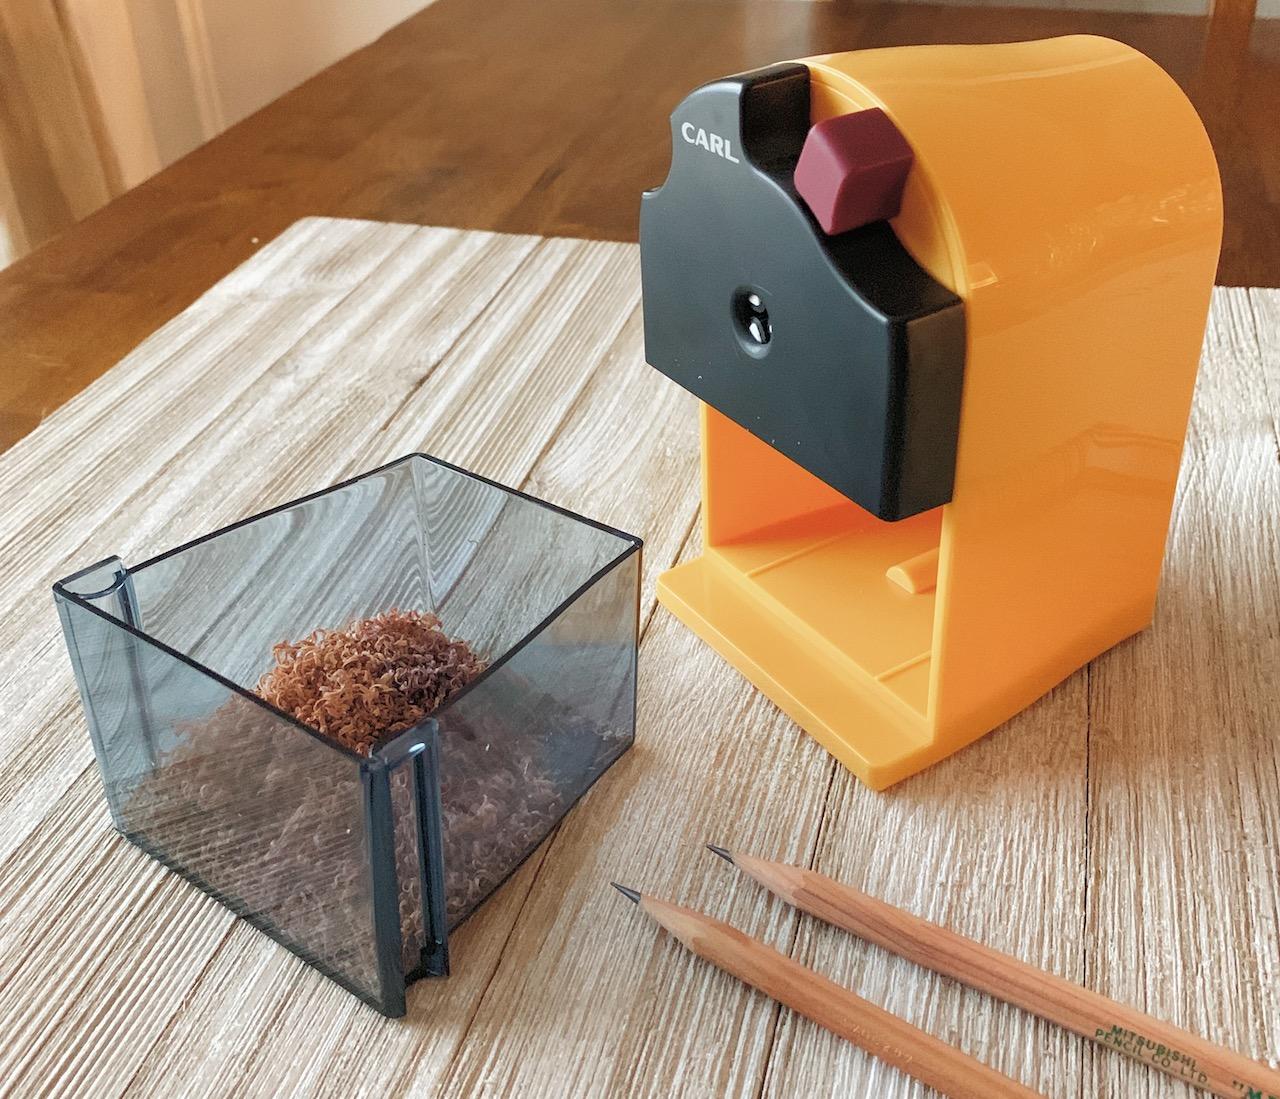 Carl Ein Pencil Sharpener Tray